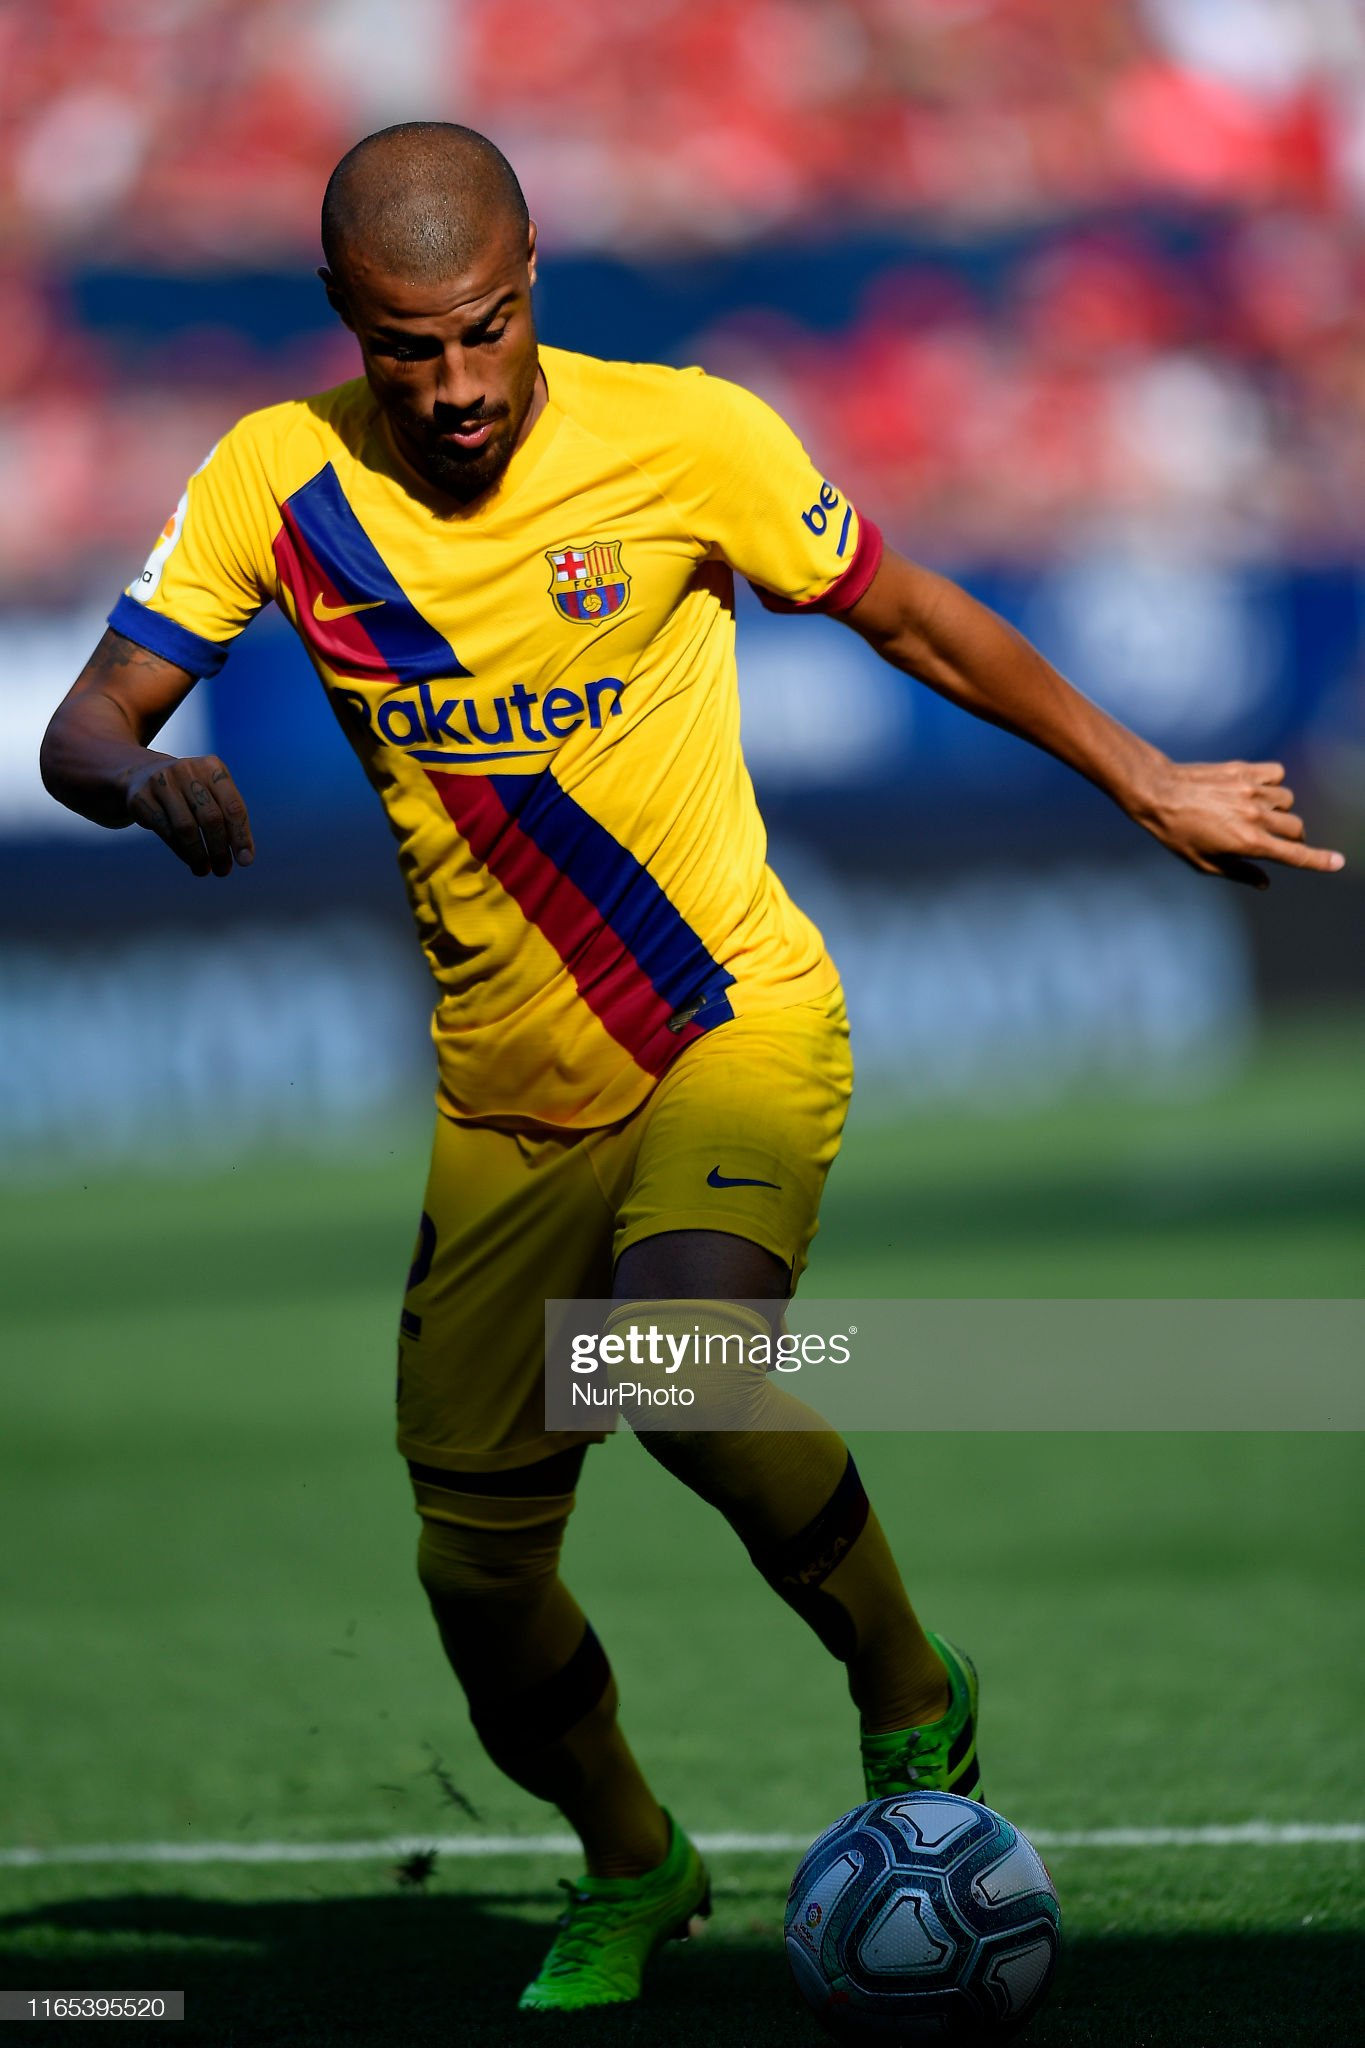 صور مباراة : أوساسونا - برشلونة 2-2 ( 31-08-2019 )  Rafinha-of-barcelona-in-action-during-the-liga-match-between-ca-and-picture-id1165395520?s=2048x2048